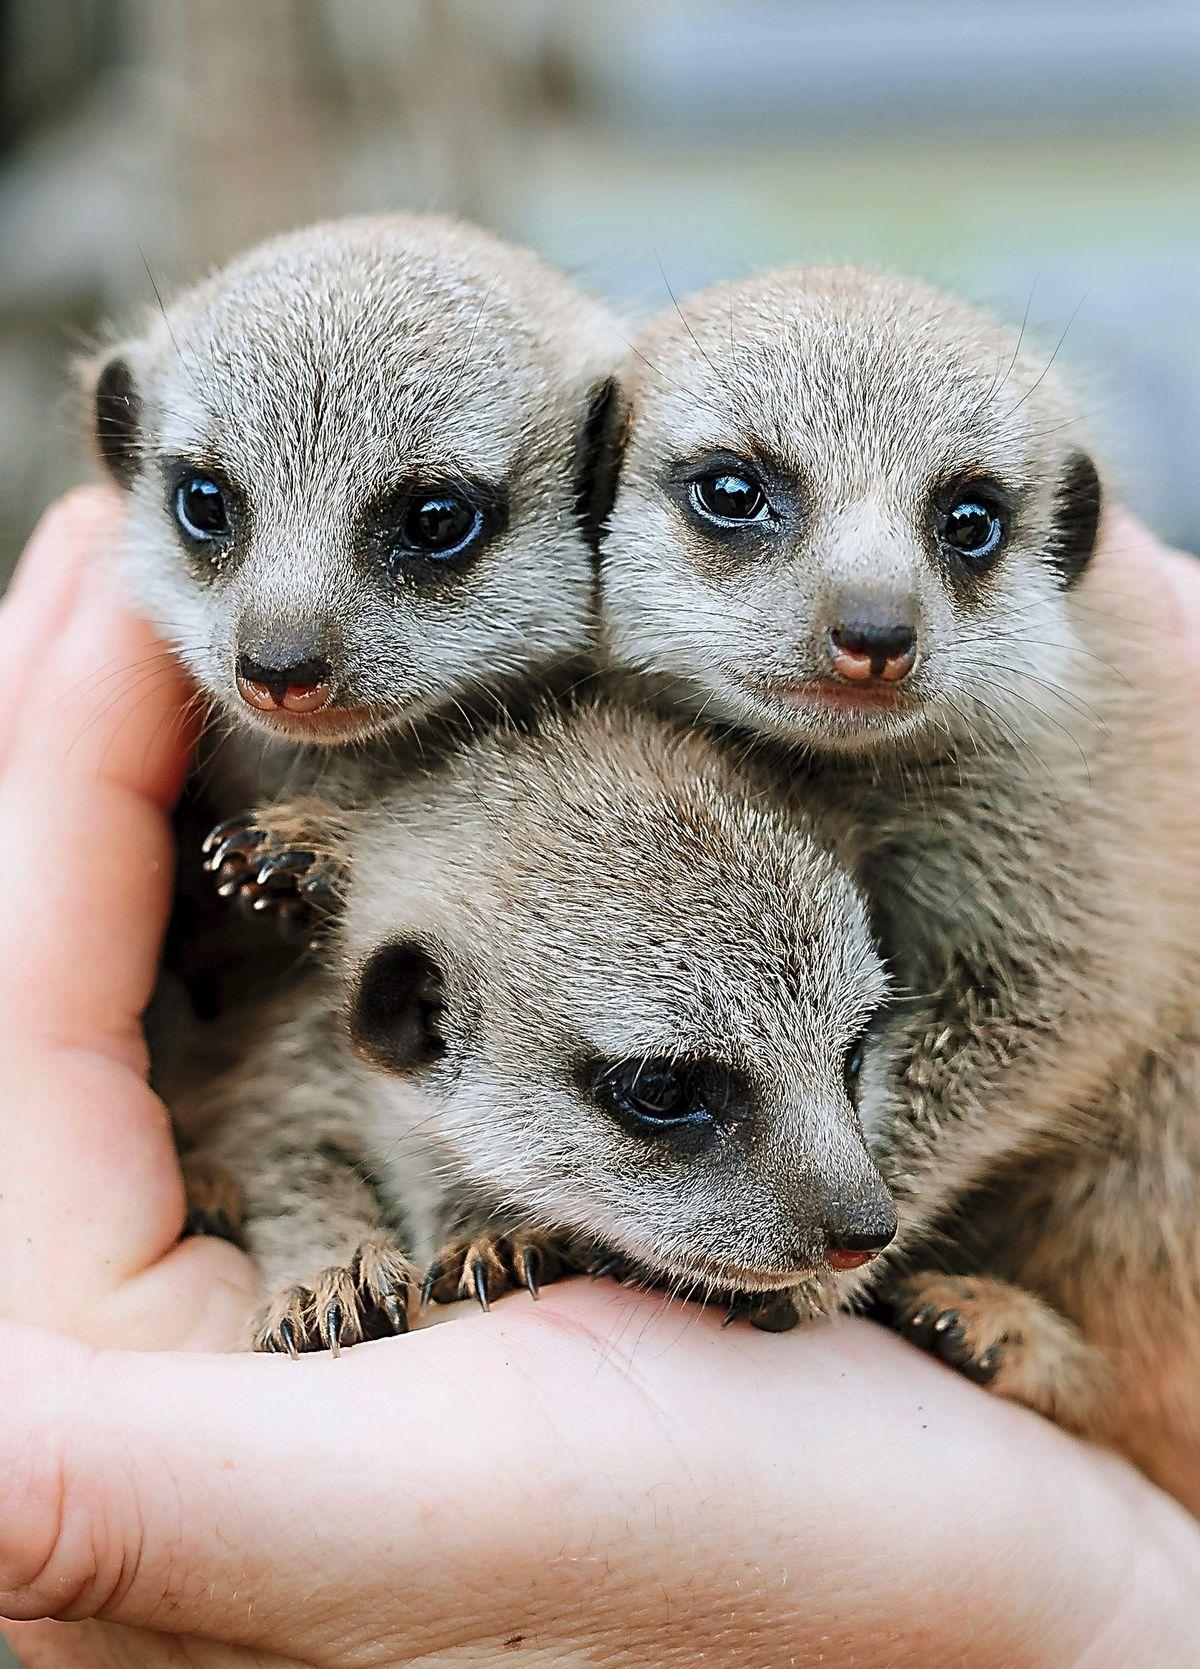 Baby Meerkats born at Exotic Zoo in Telford